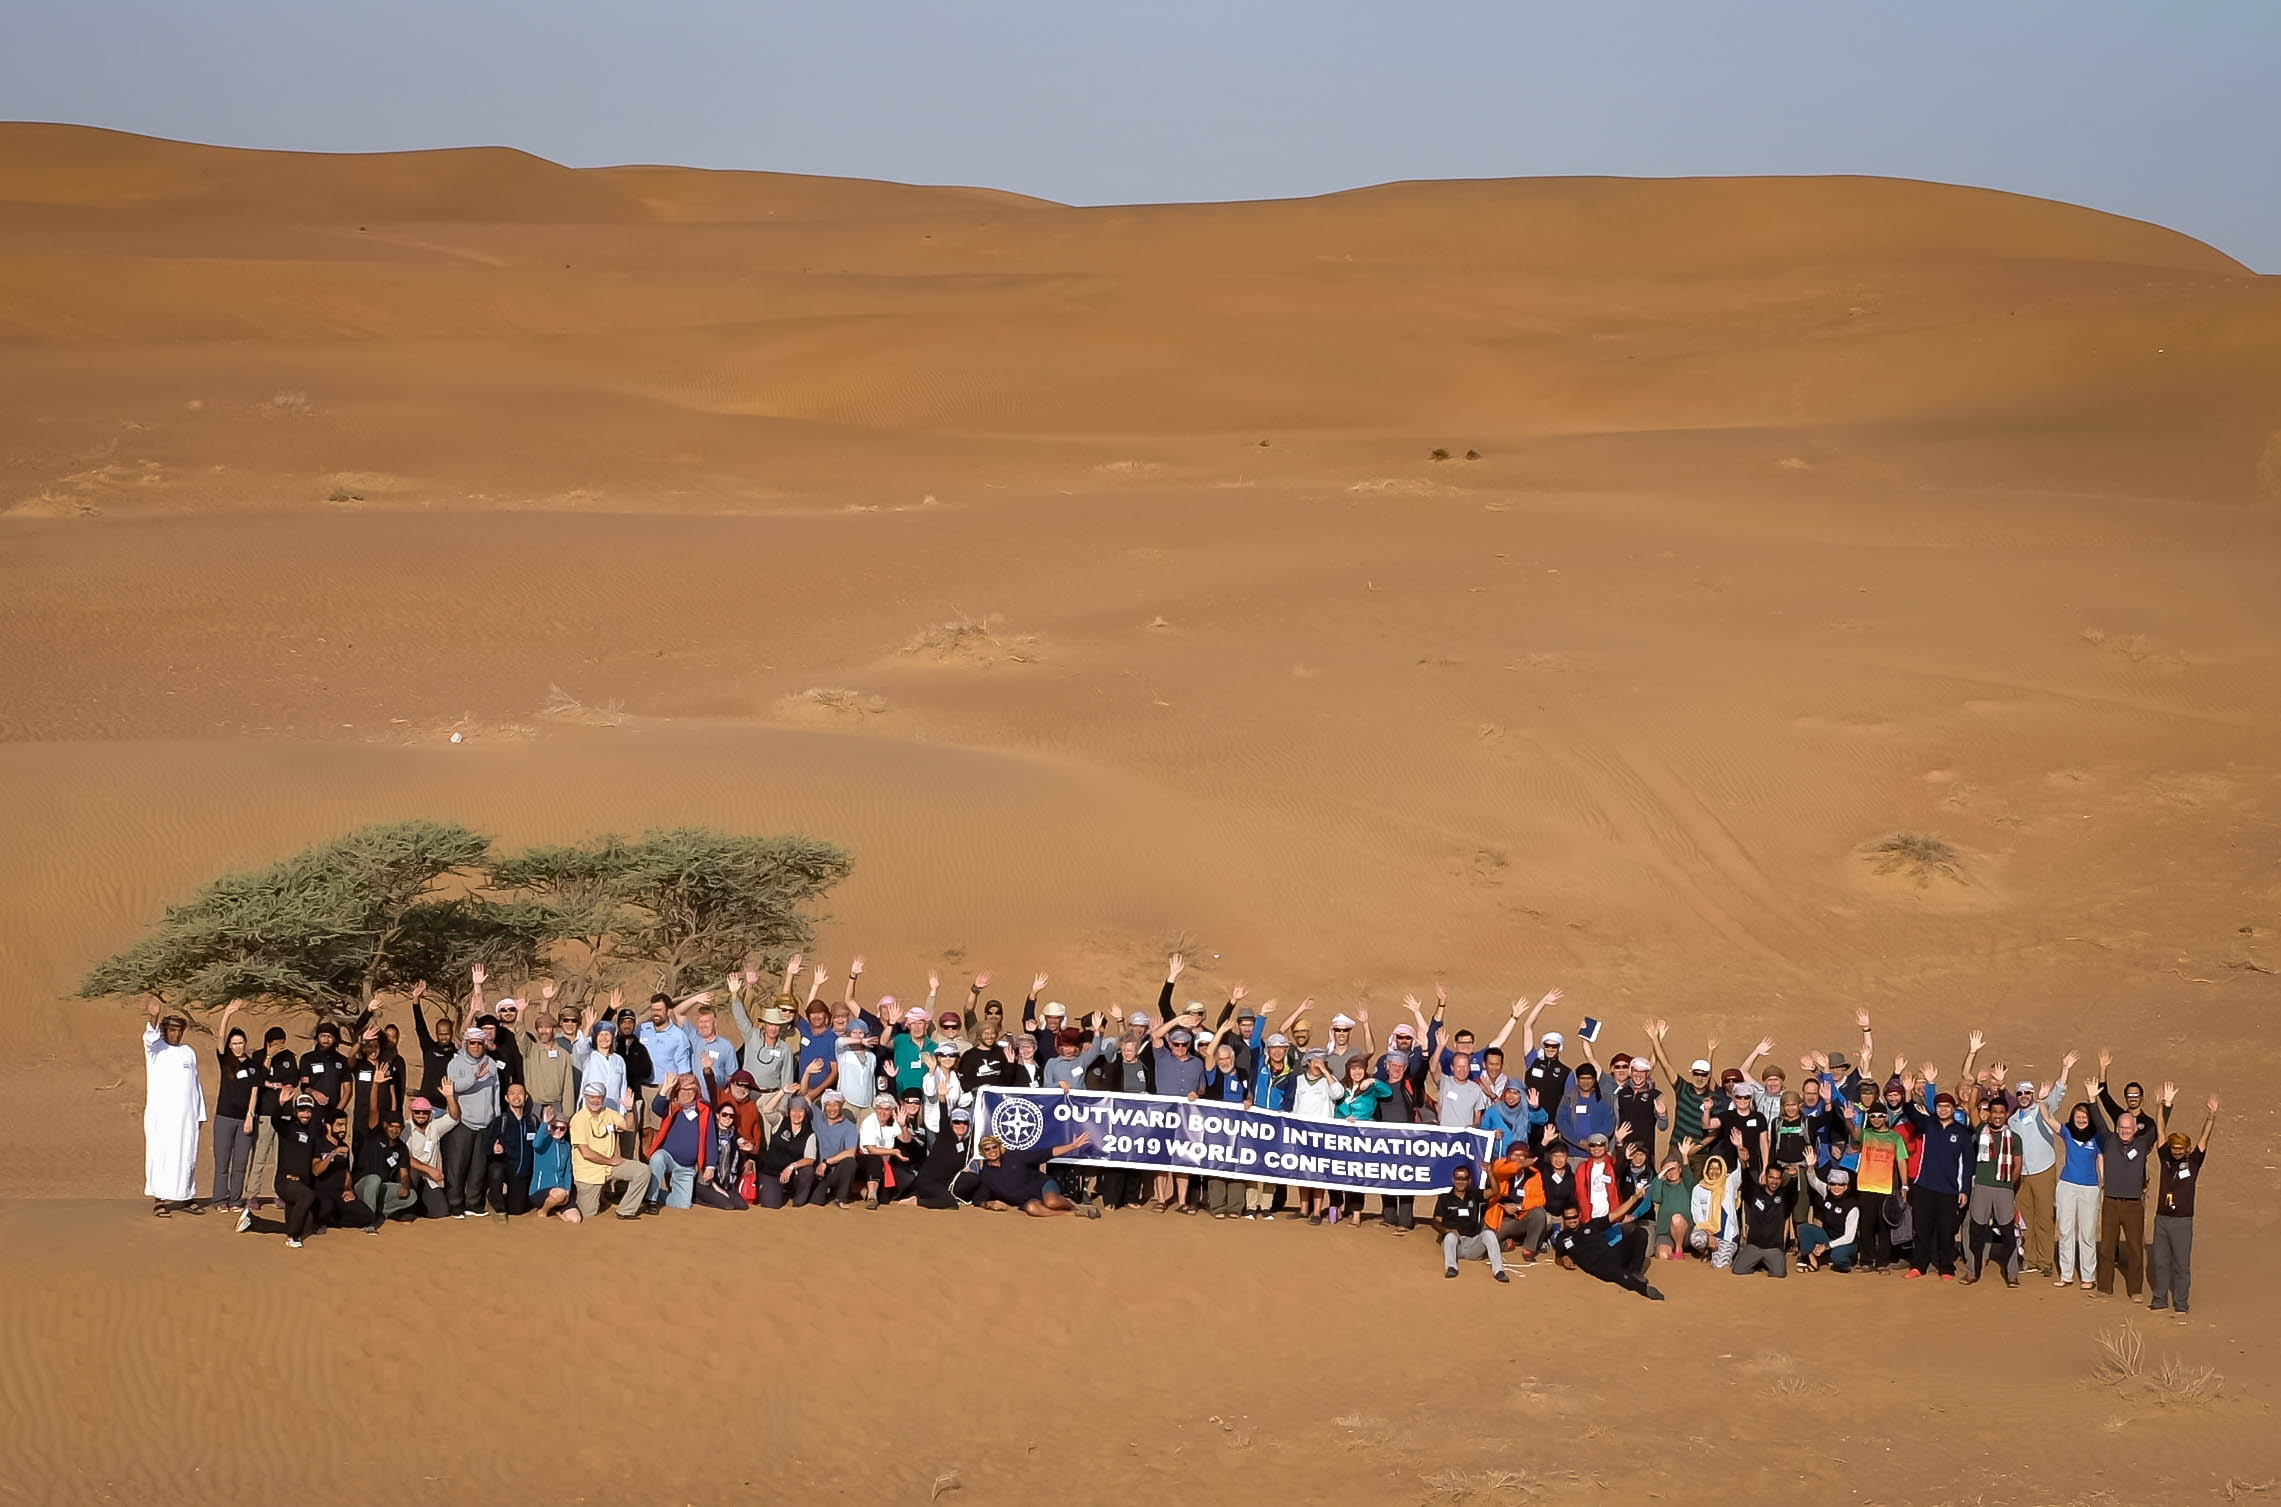 Outward Bound International Conference – Outward Bound Oman